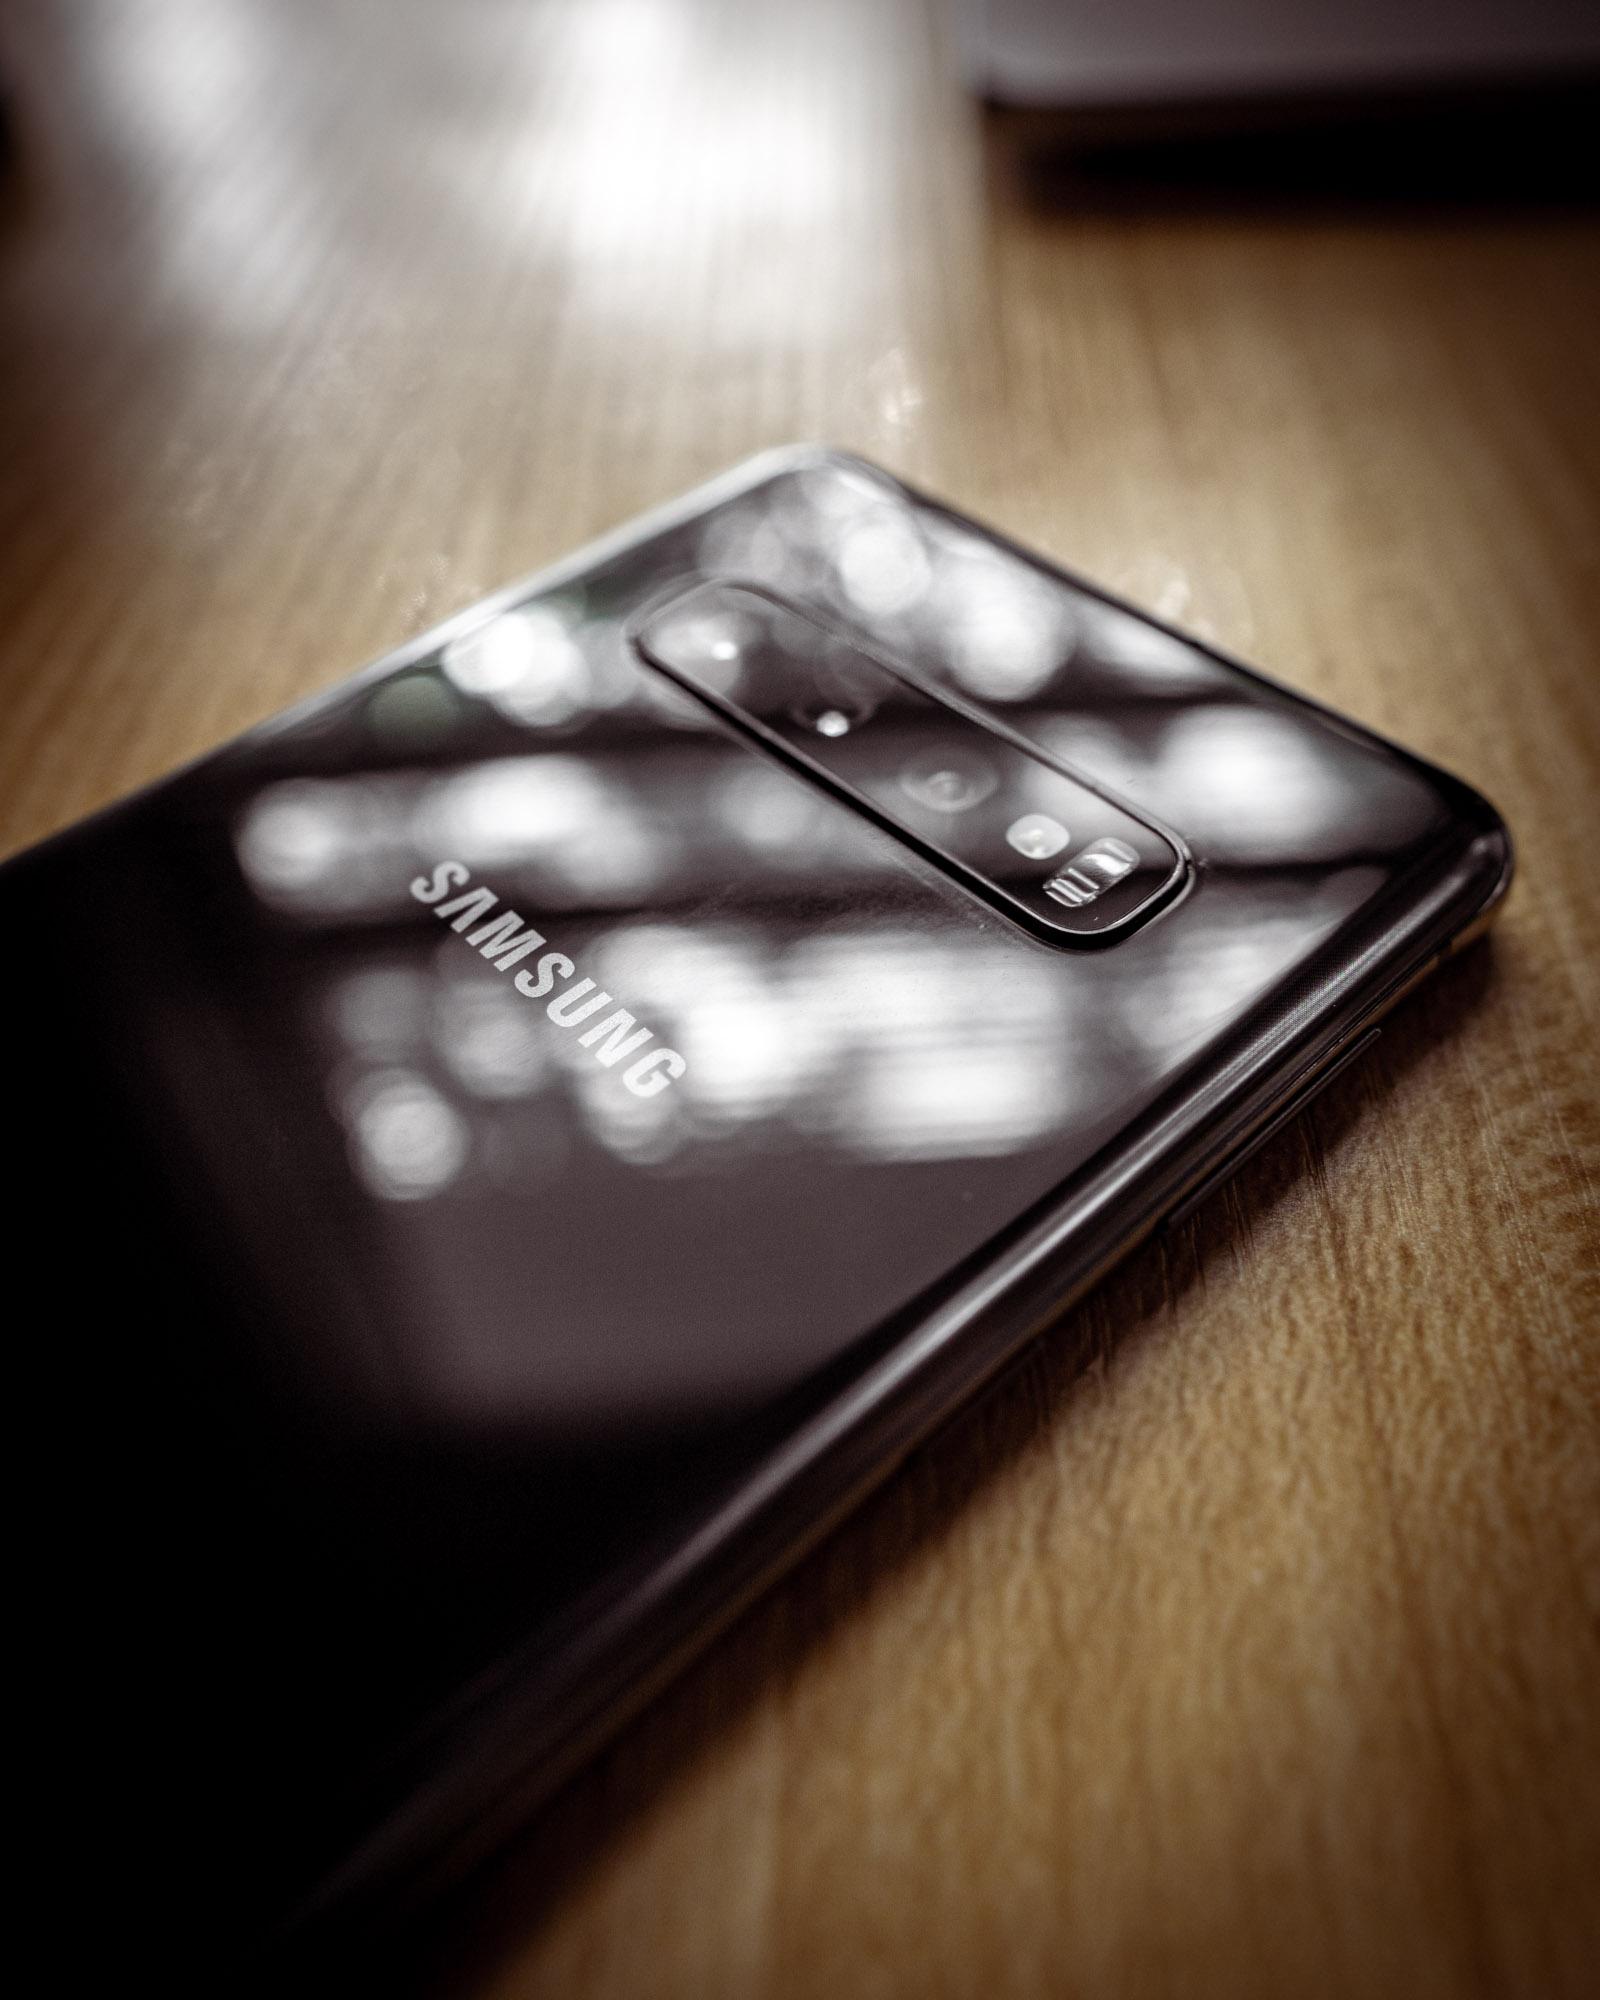 My New Phone Samsung Galaxy s10